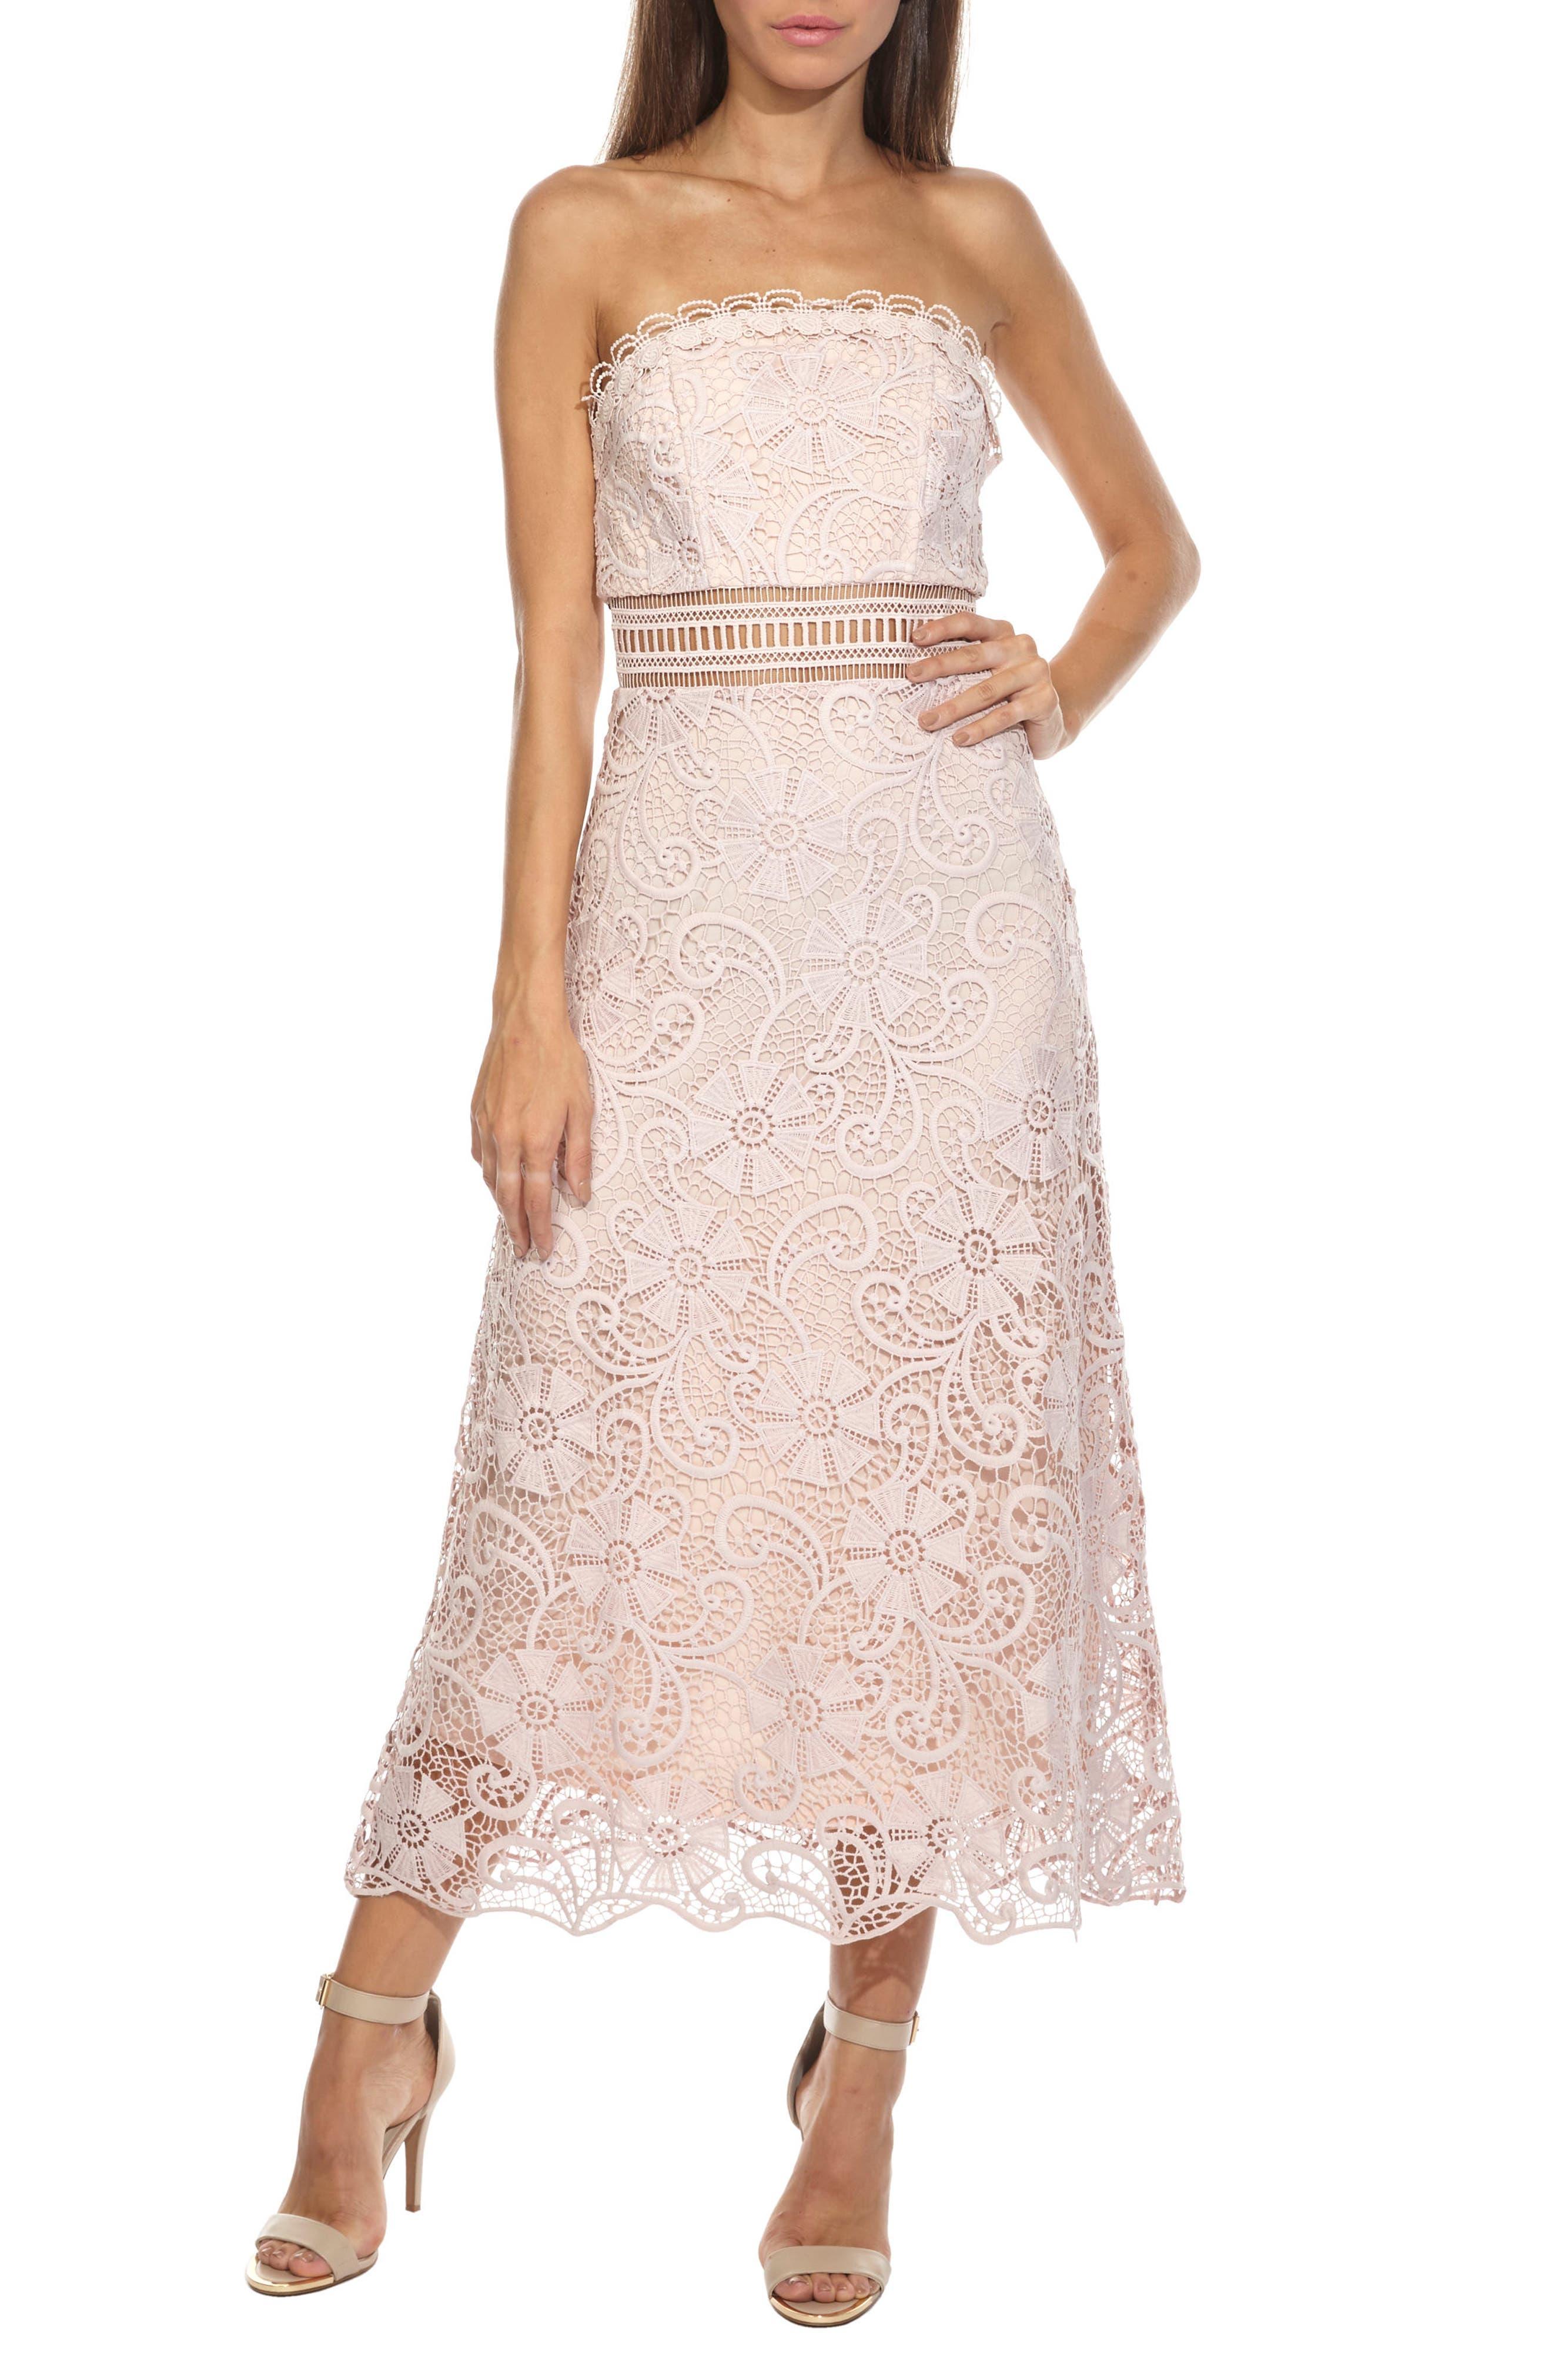 Yani Lace Strapless Midi Dress,                             Main thumbnail 1, color,                             PINK